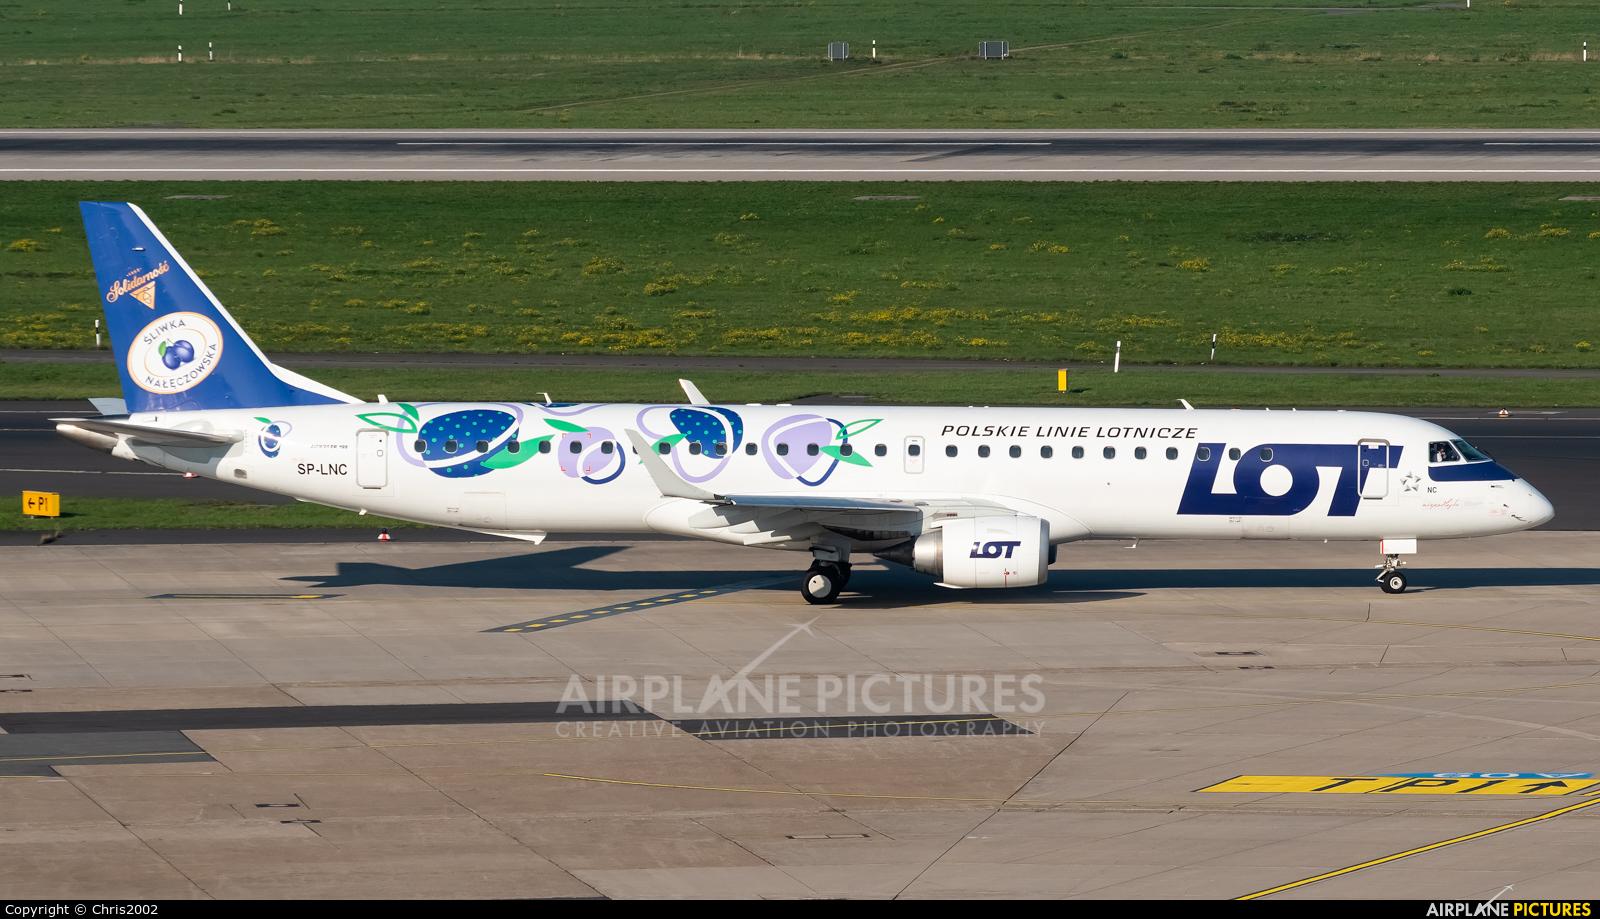 LOT - Polish Airlines SP-LNC aircraft at Düsseldorf